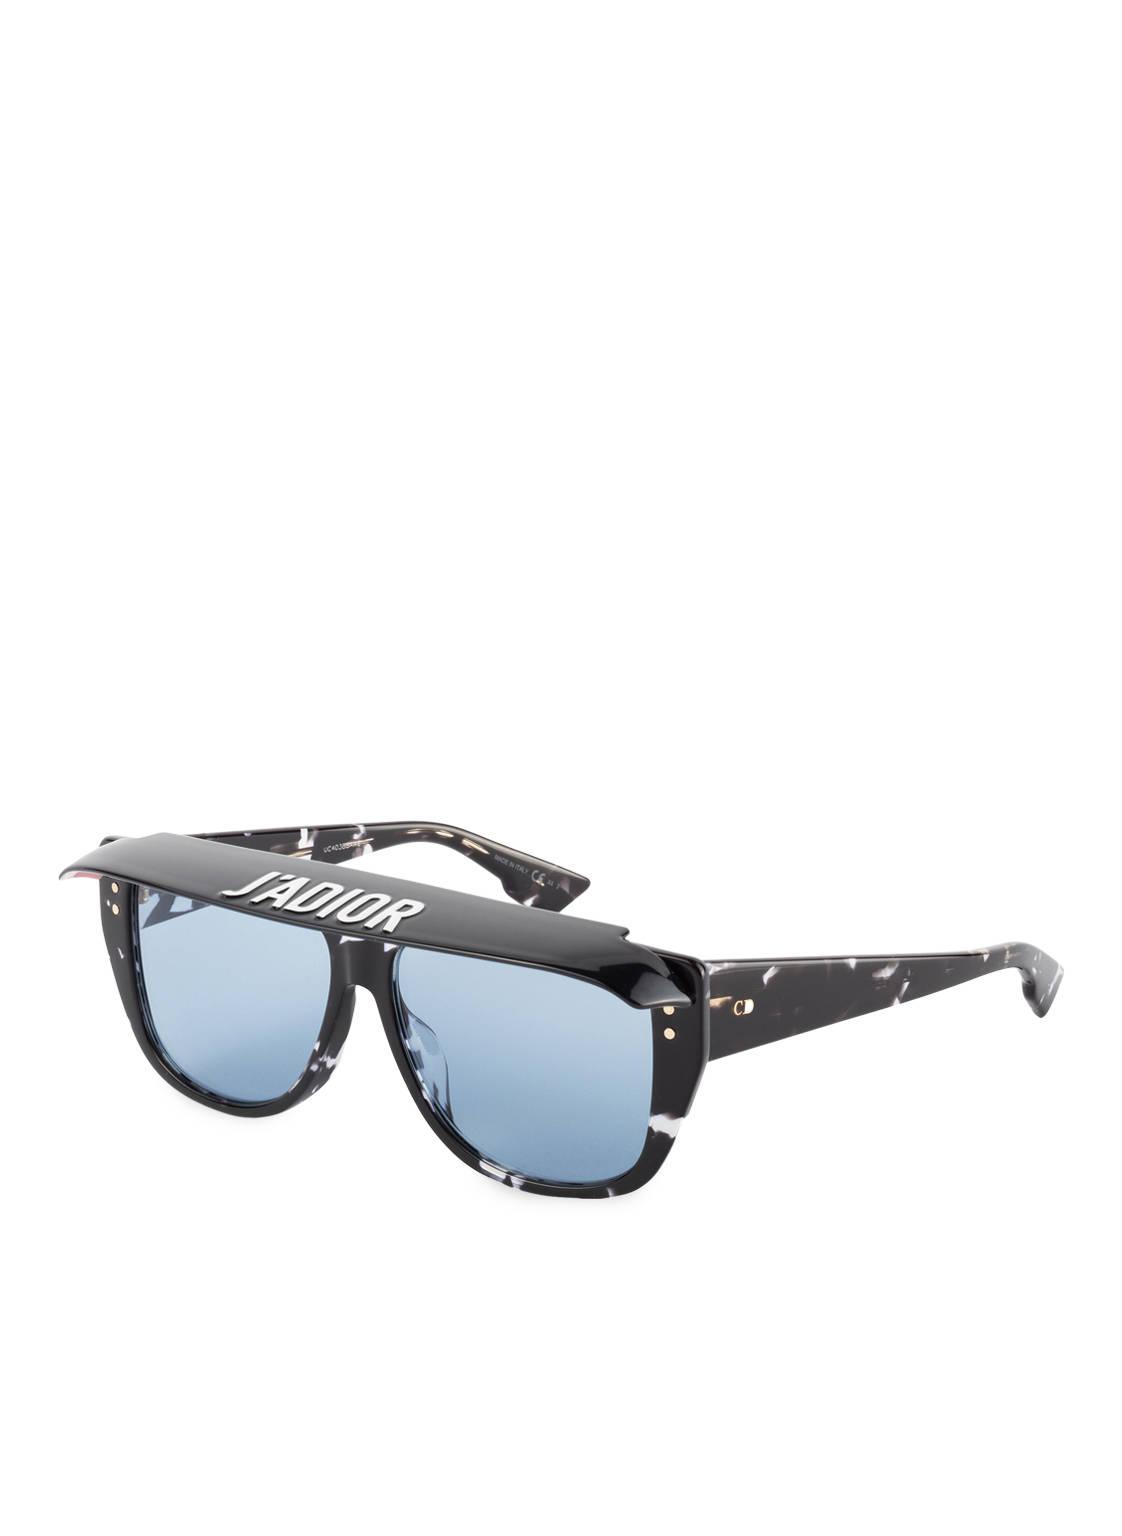 Sunglasses Sonnenbrille DIORCLUB2